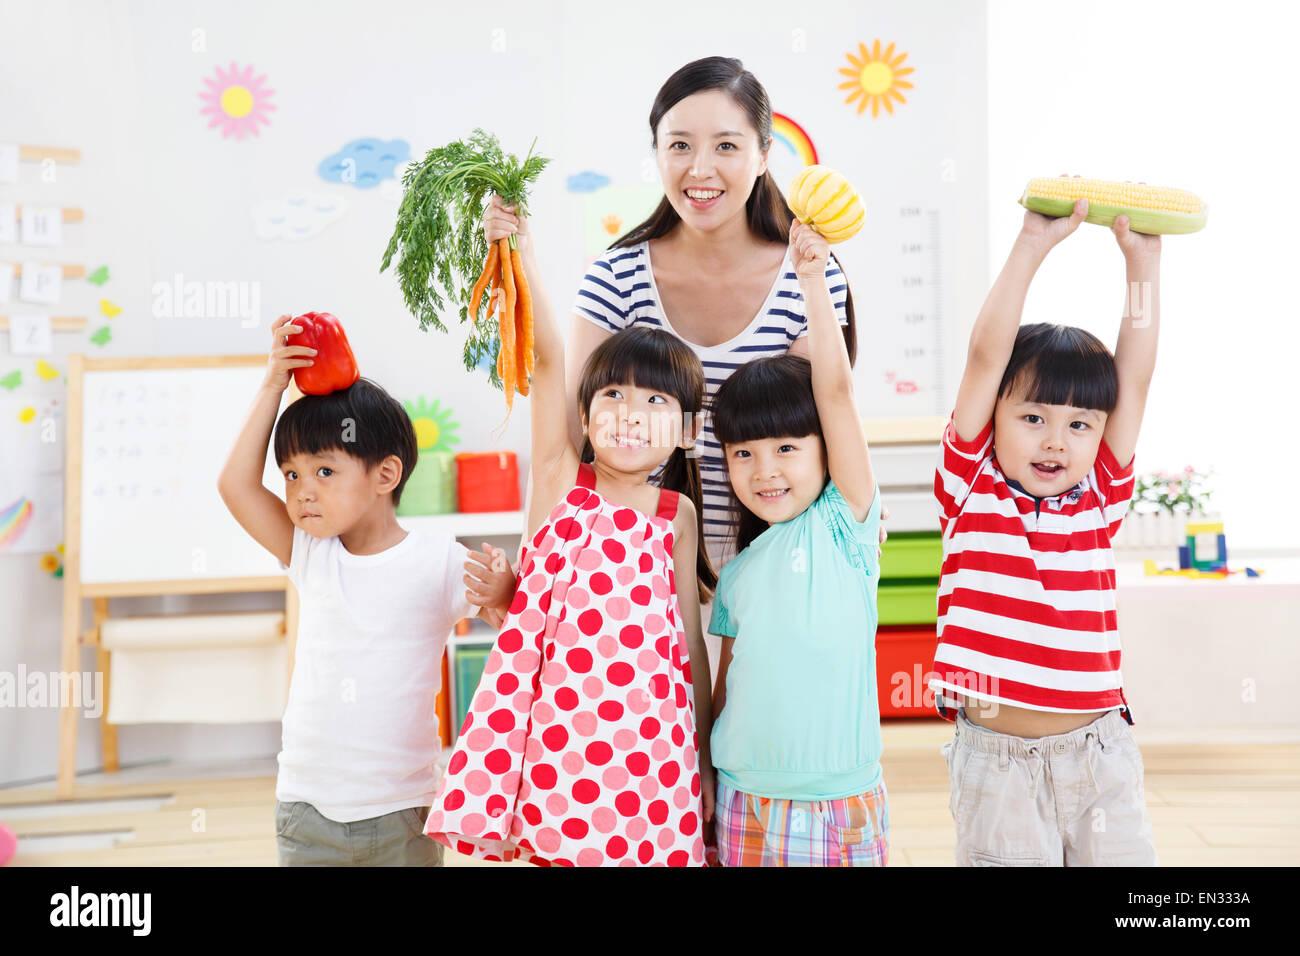 Kindergarten Classroom Kids Stock Photos Amp Kindergarten Classroom Kids Stock Images